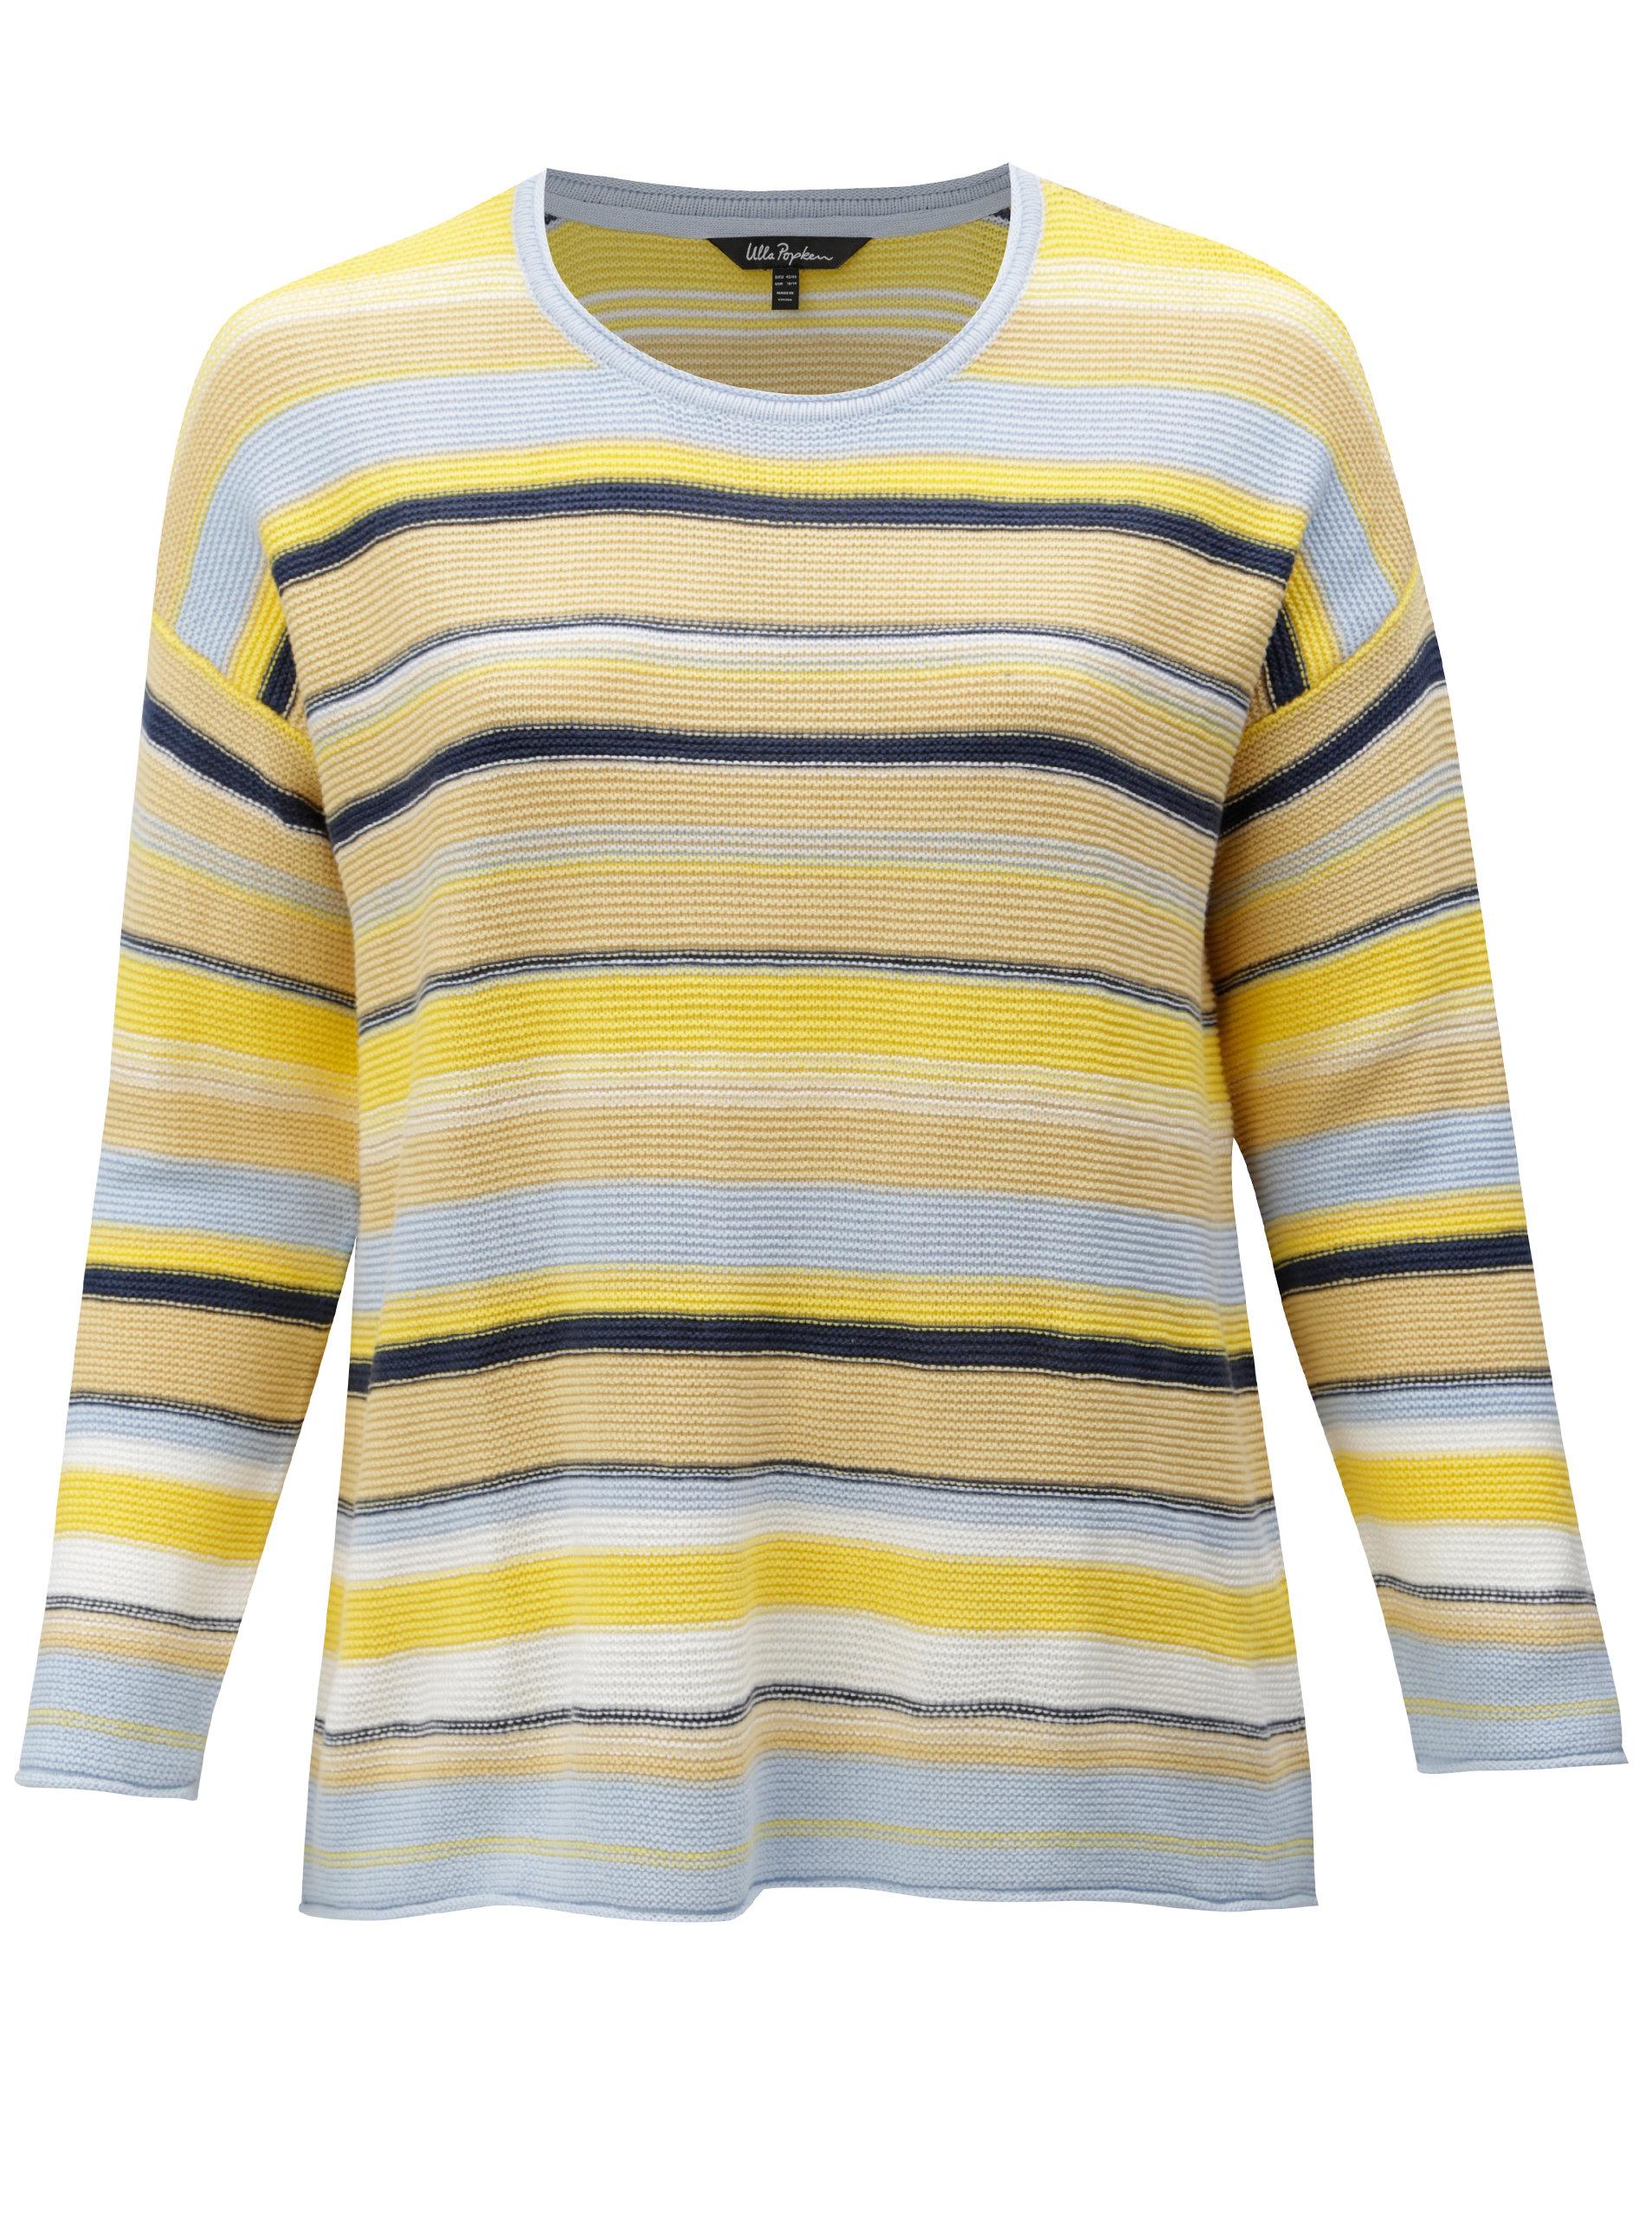 Modro-žlutý pruhovaný svetr Ulla Popken ... cbe8d0c393